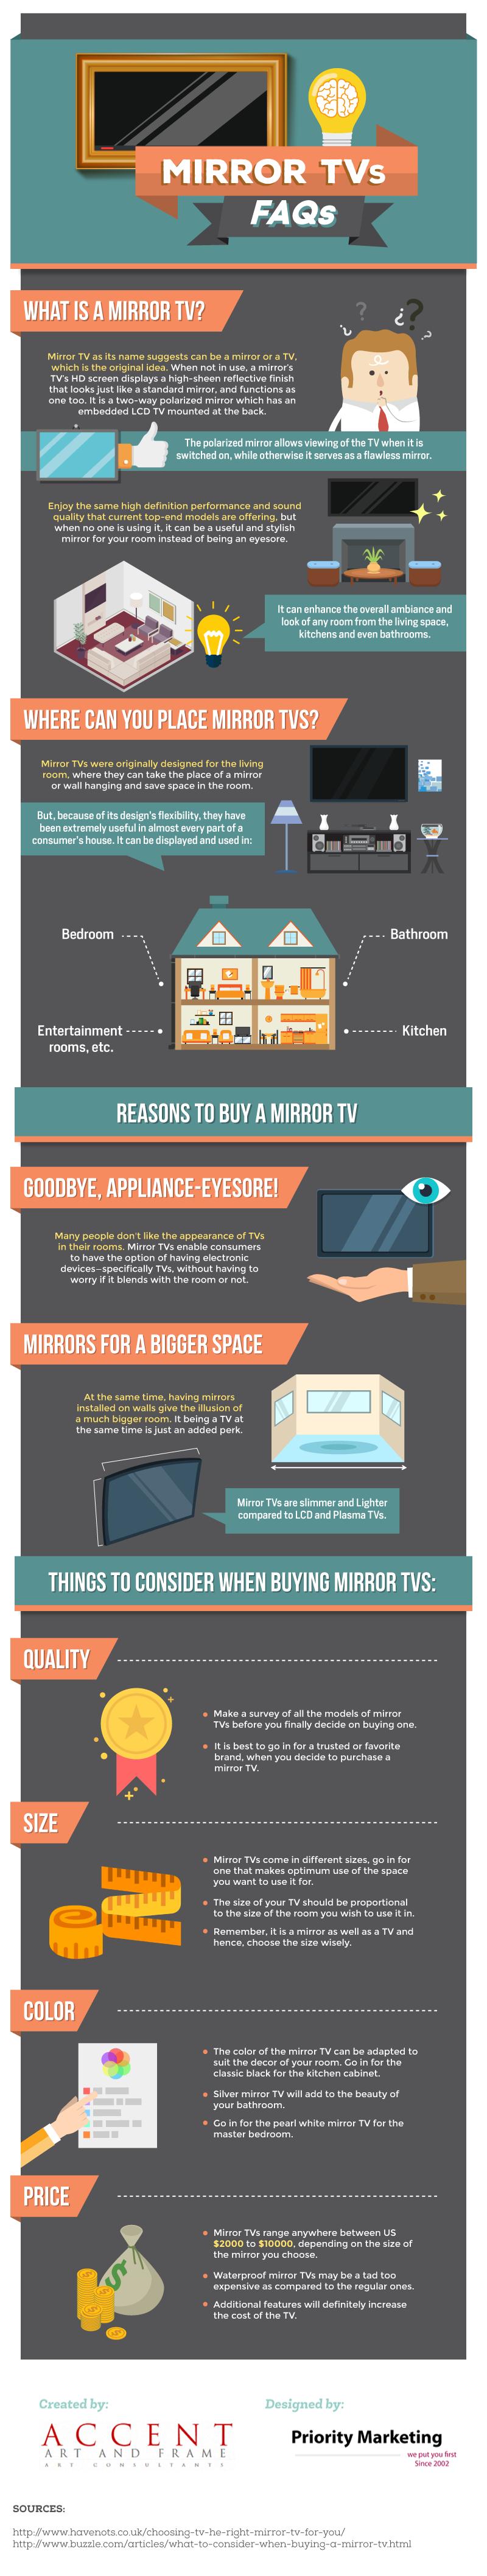 Mirror TVs FAQs Infographic